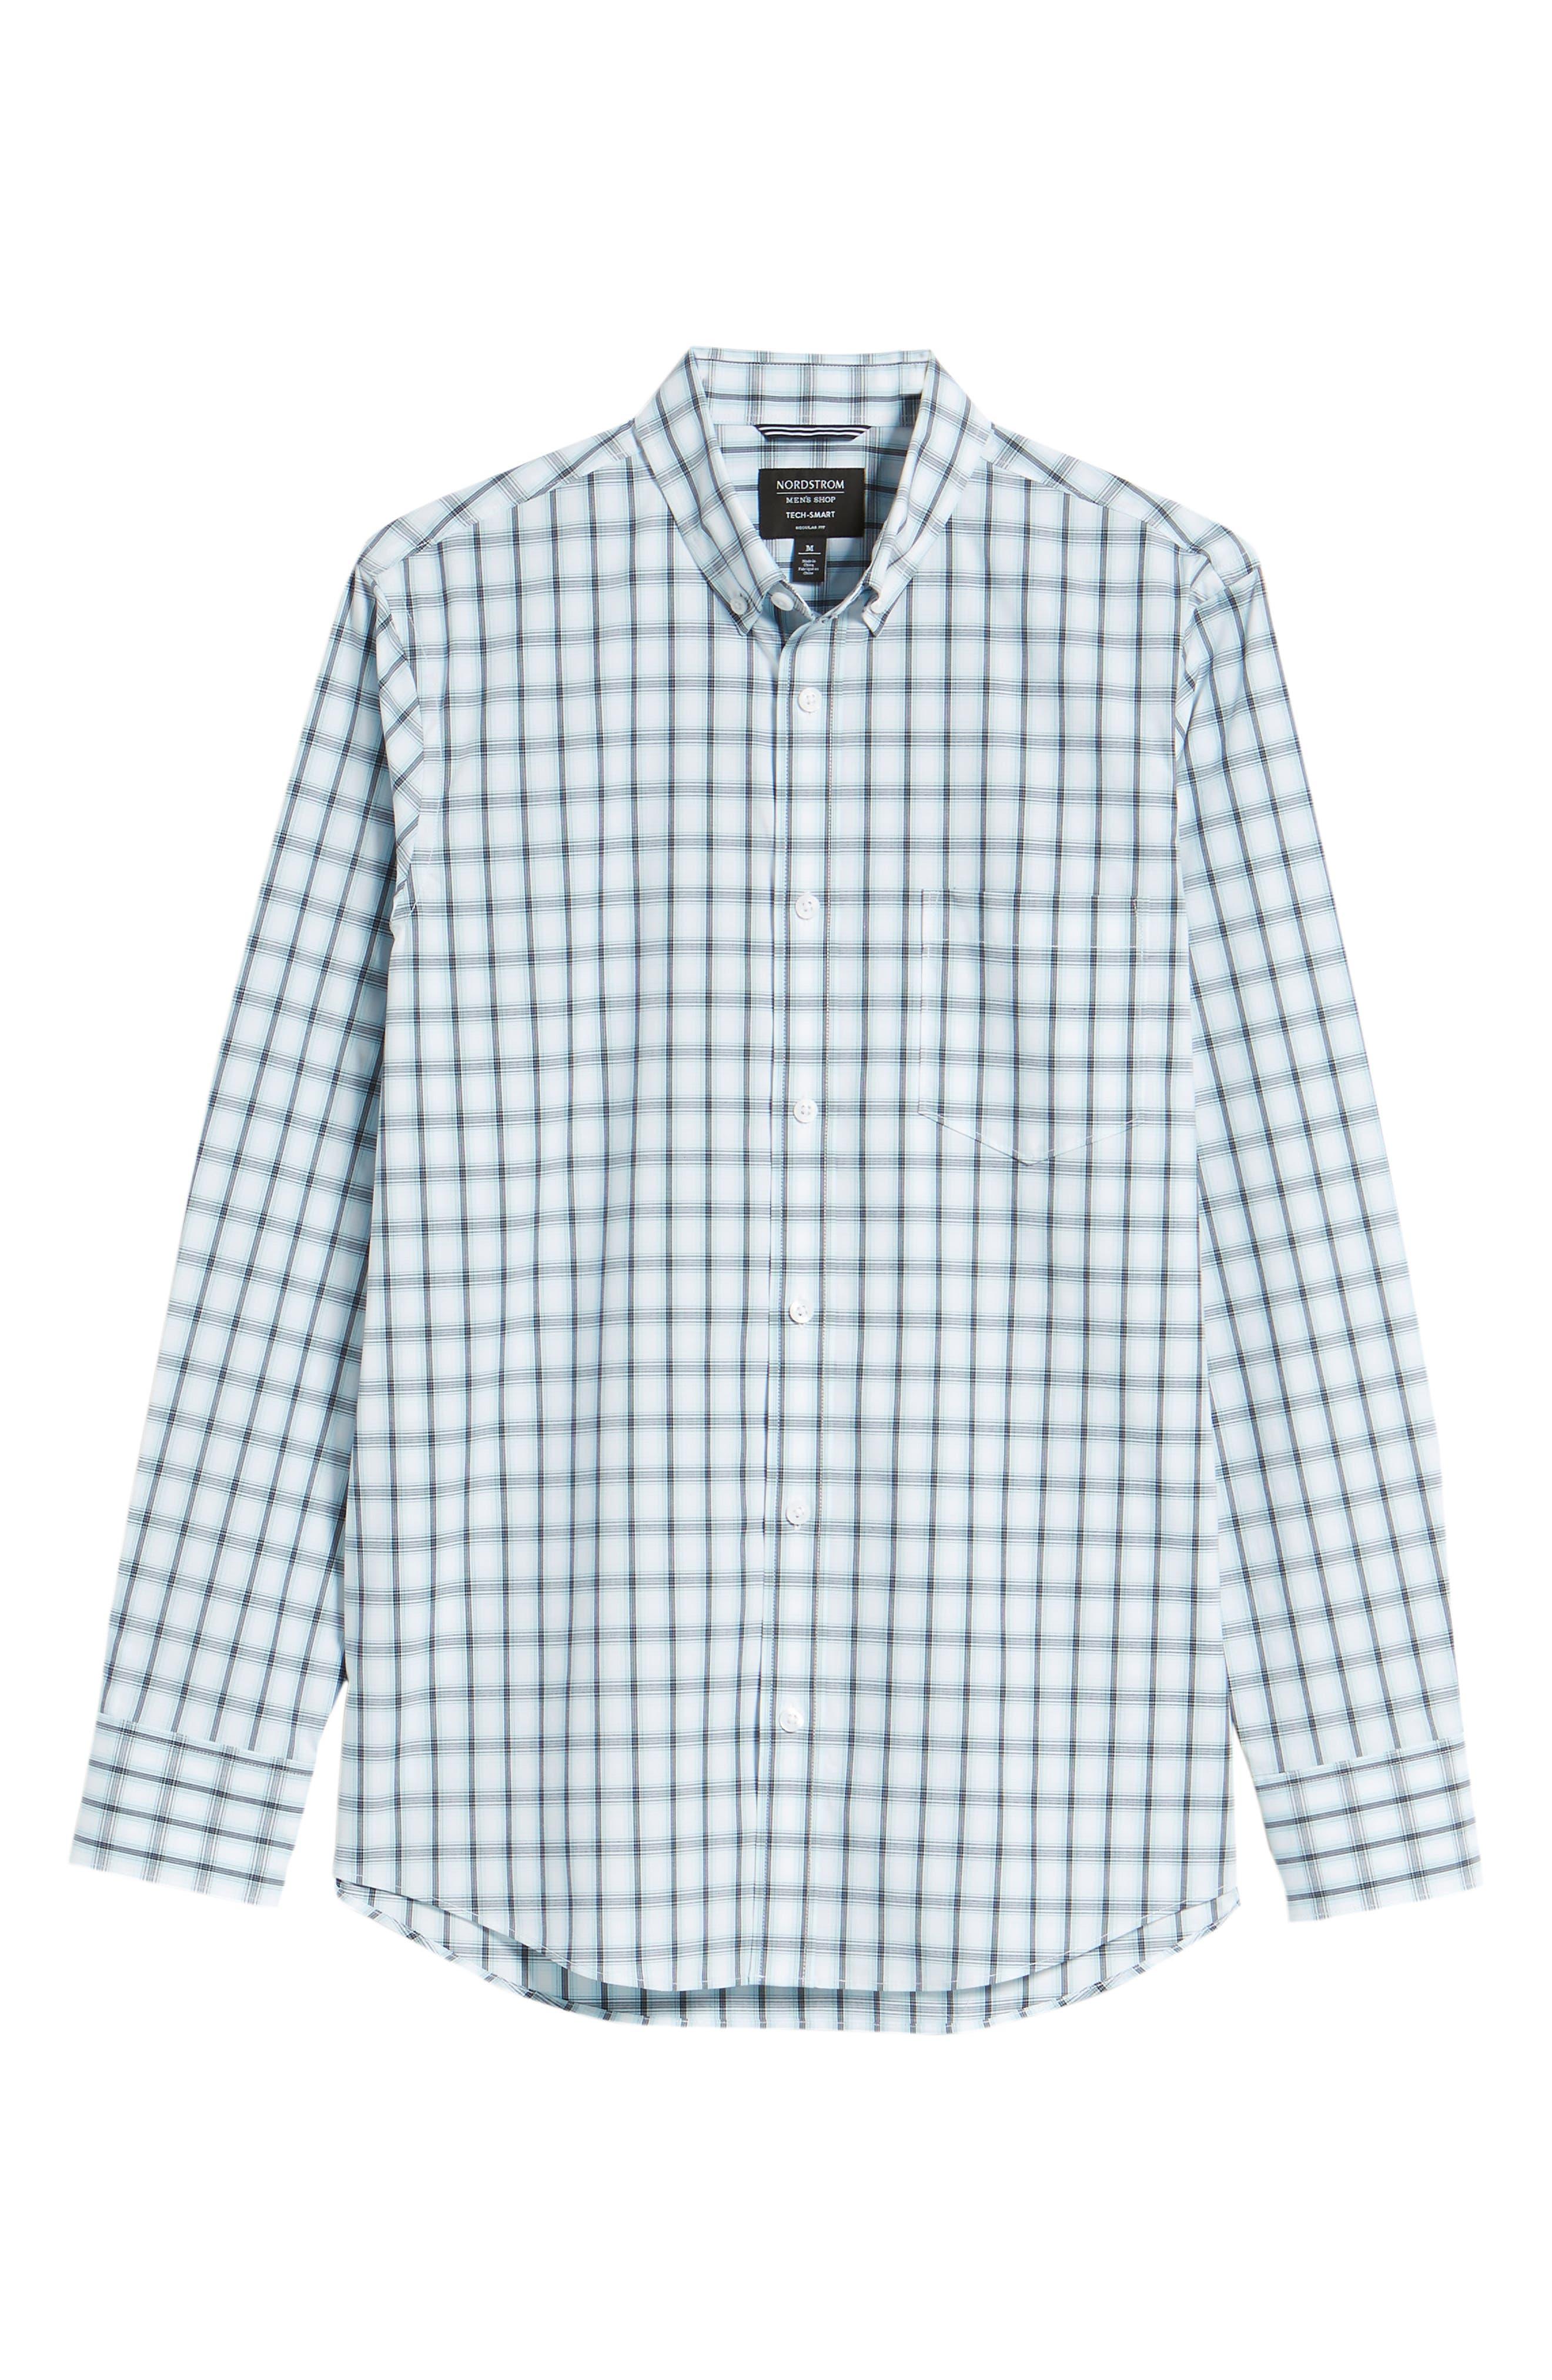 Tech-Smart Regular Fit Check Sport Shirt,                             Alternate thumbnail 6, color,                             Blue Orydalis Ombre Check